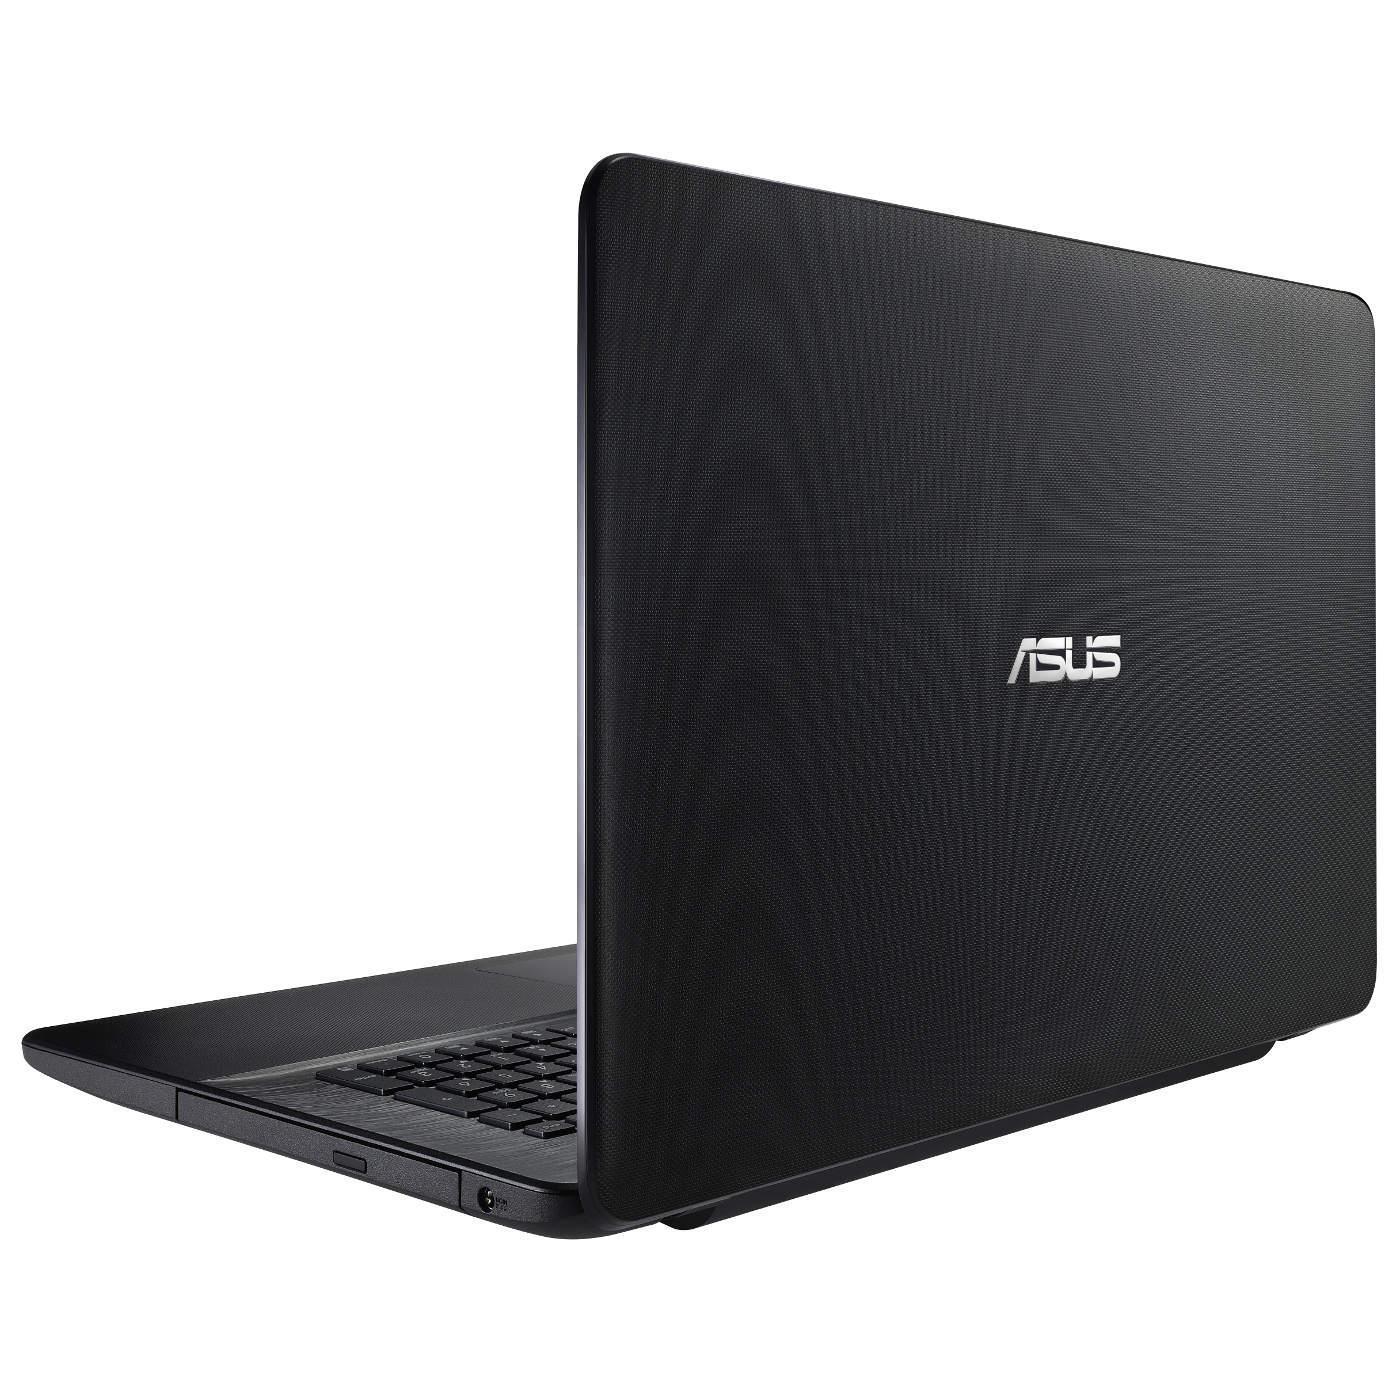 Asus X751LAV-TY432T - Core i3-5005U 2 GHz - HDD 1024 Go - RAM 4 Go - AZERTY